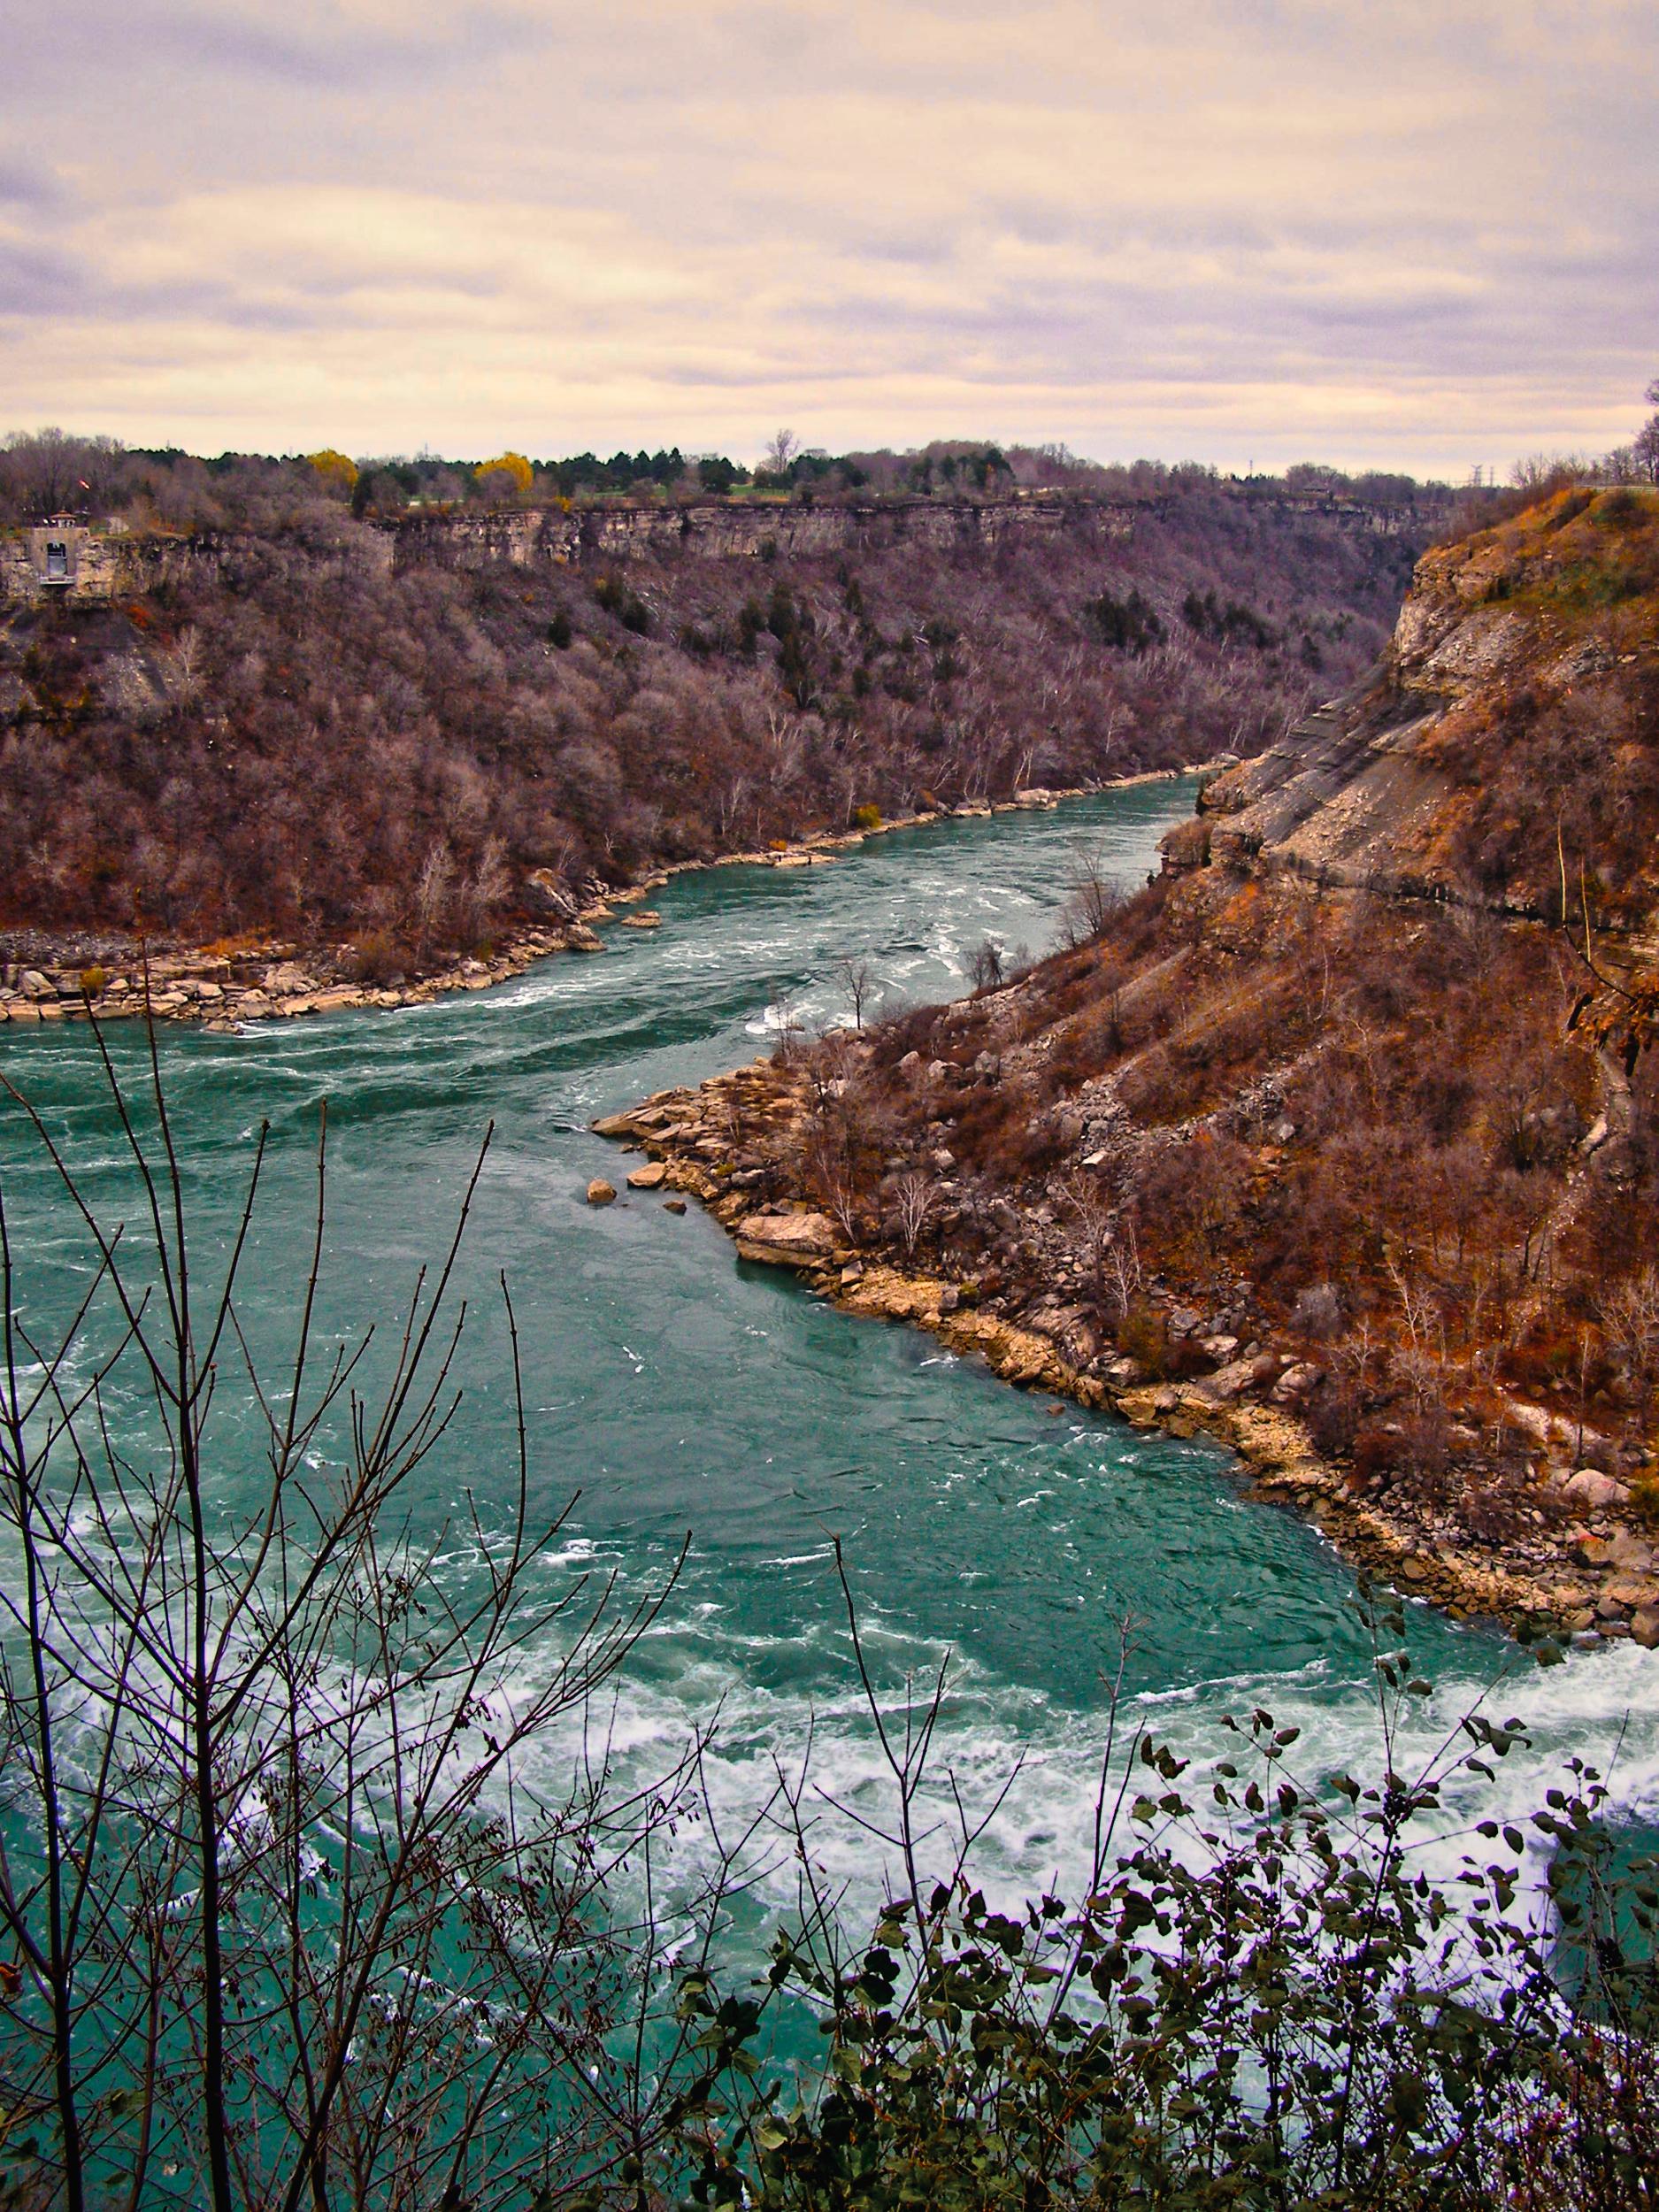 Whirlpool Rapids Bend, Niagara Park